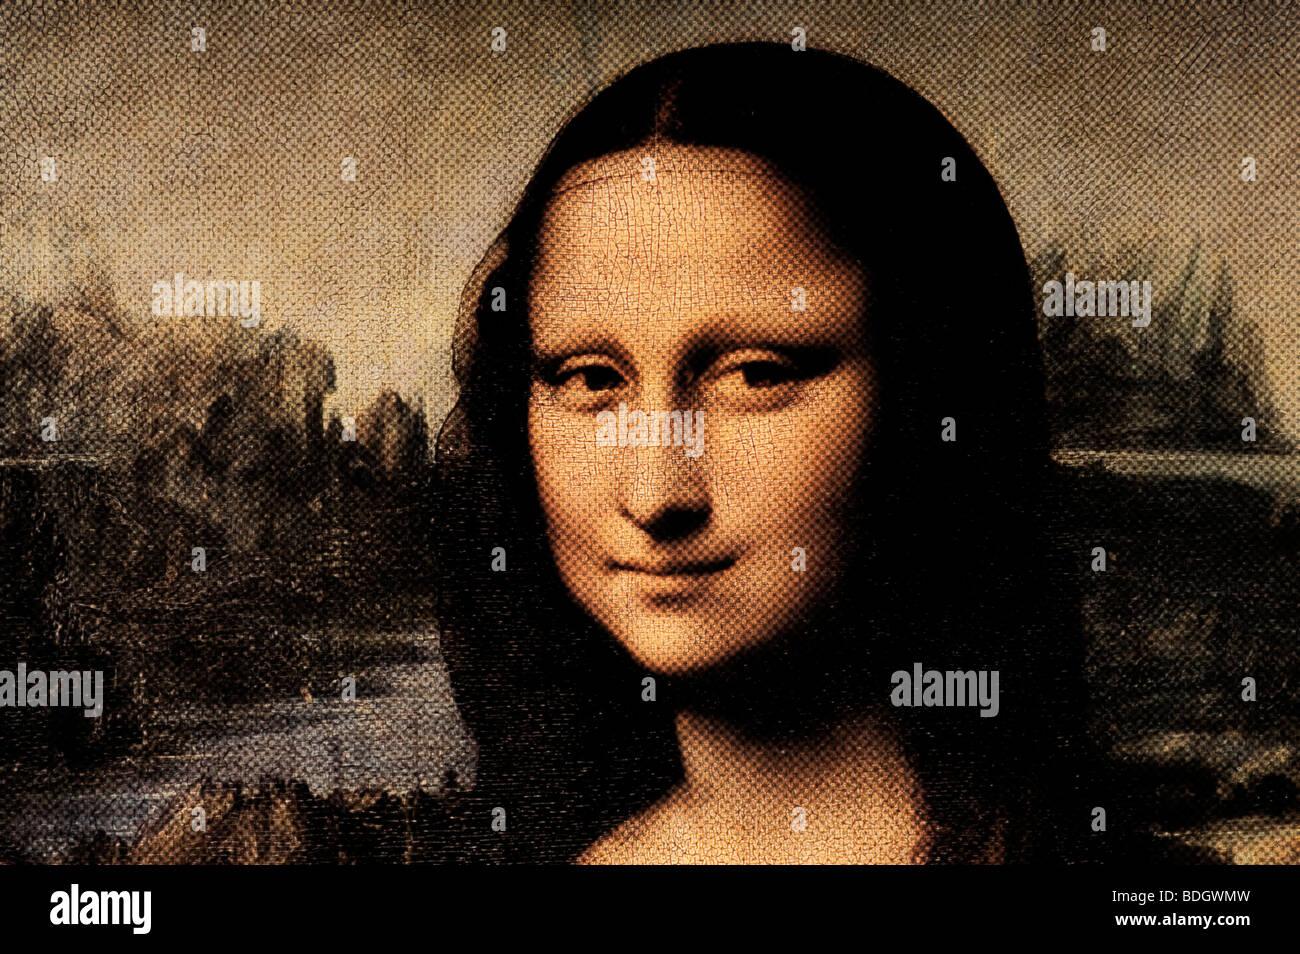 Portrait of Lisa del Giocondo (Mona Lisa) by Leonardo da Vinci halftone pattern - Stock Image